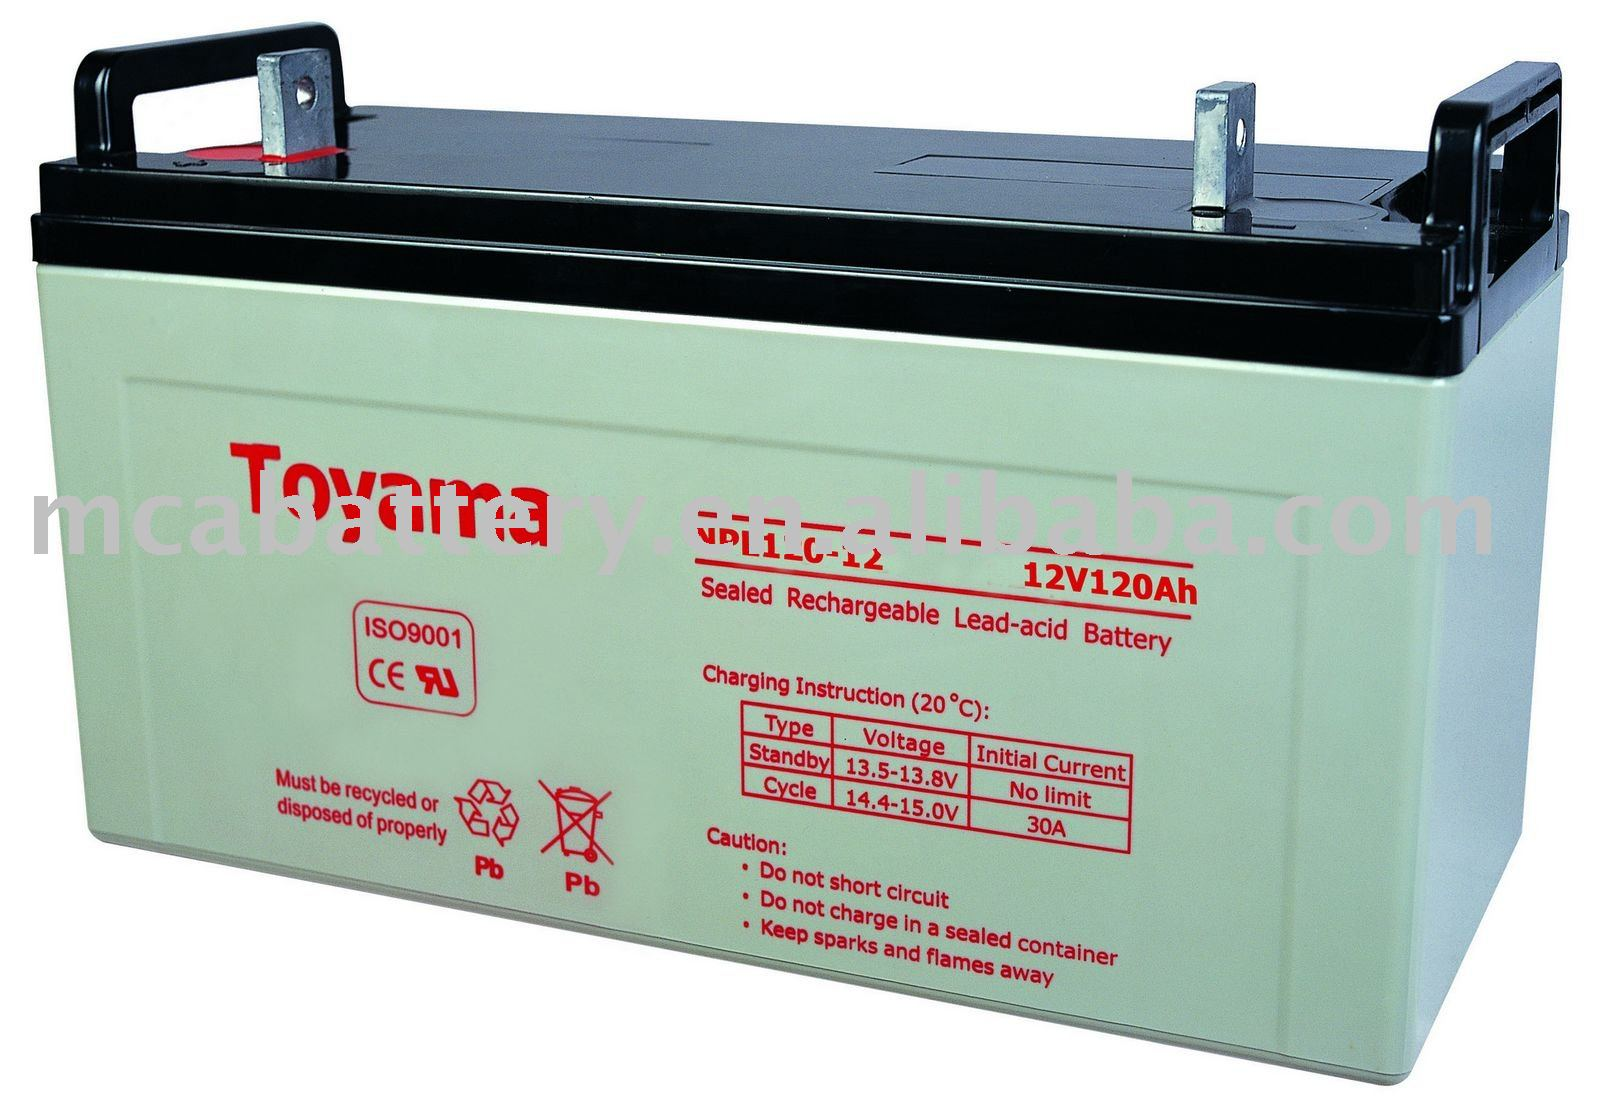 Sealed lead acid battery dangerous goods 6.1